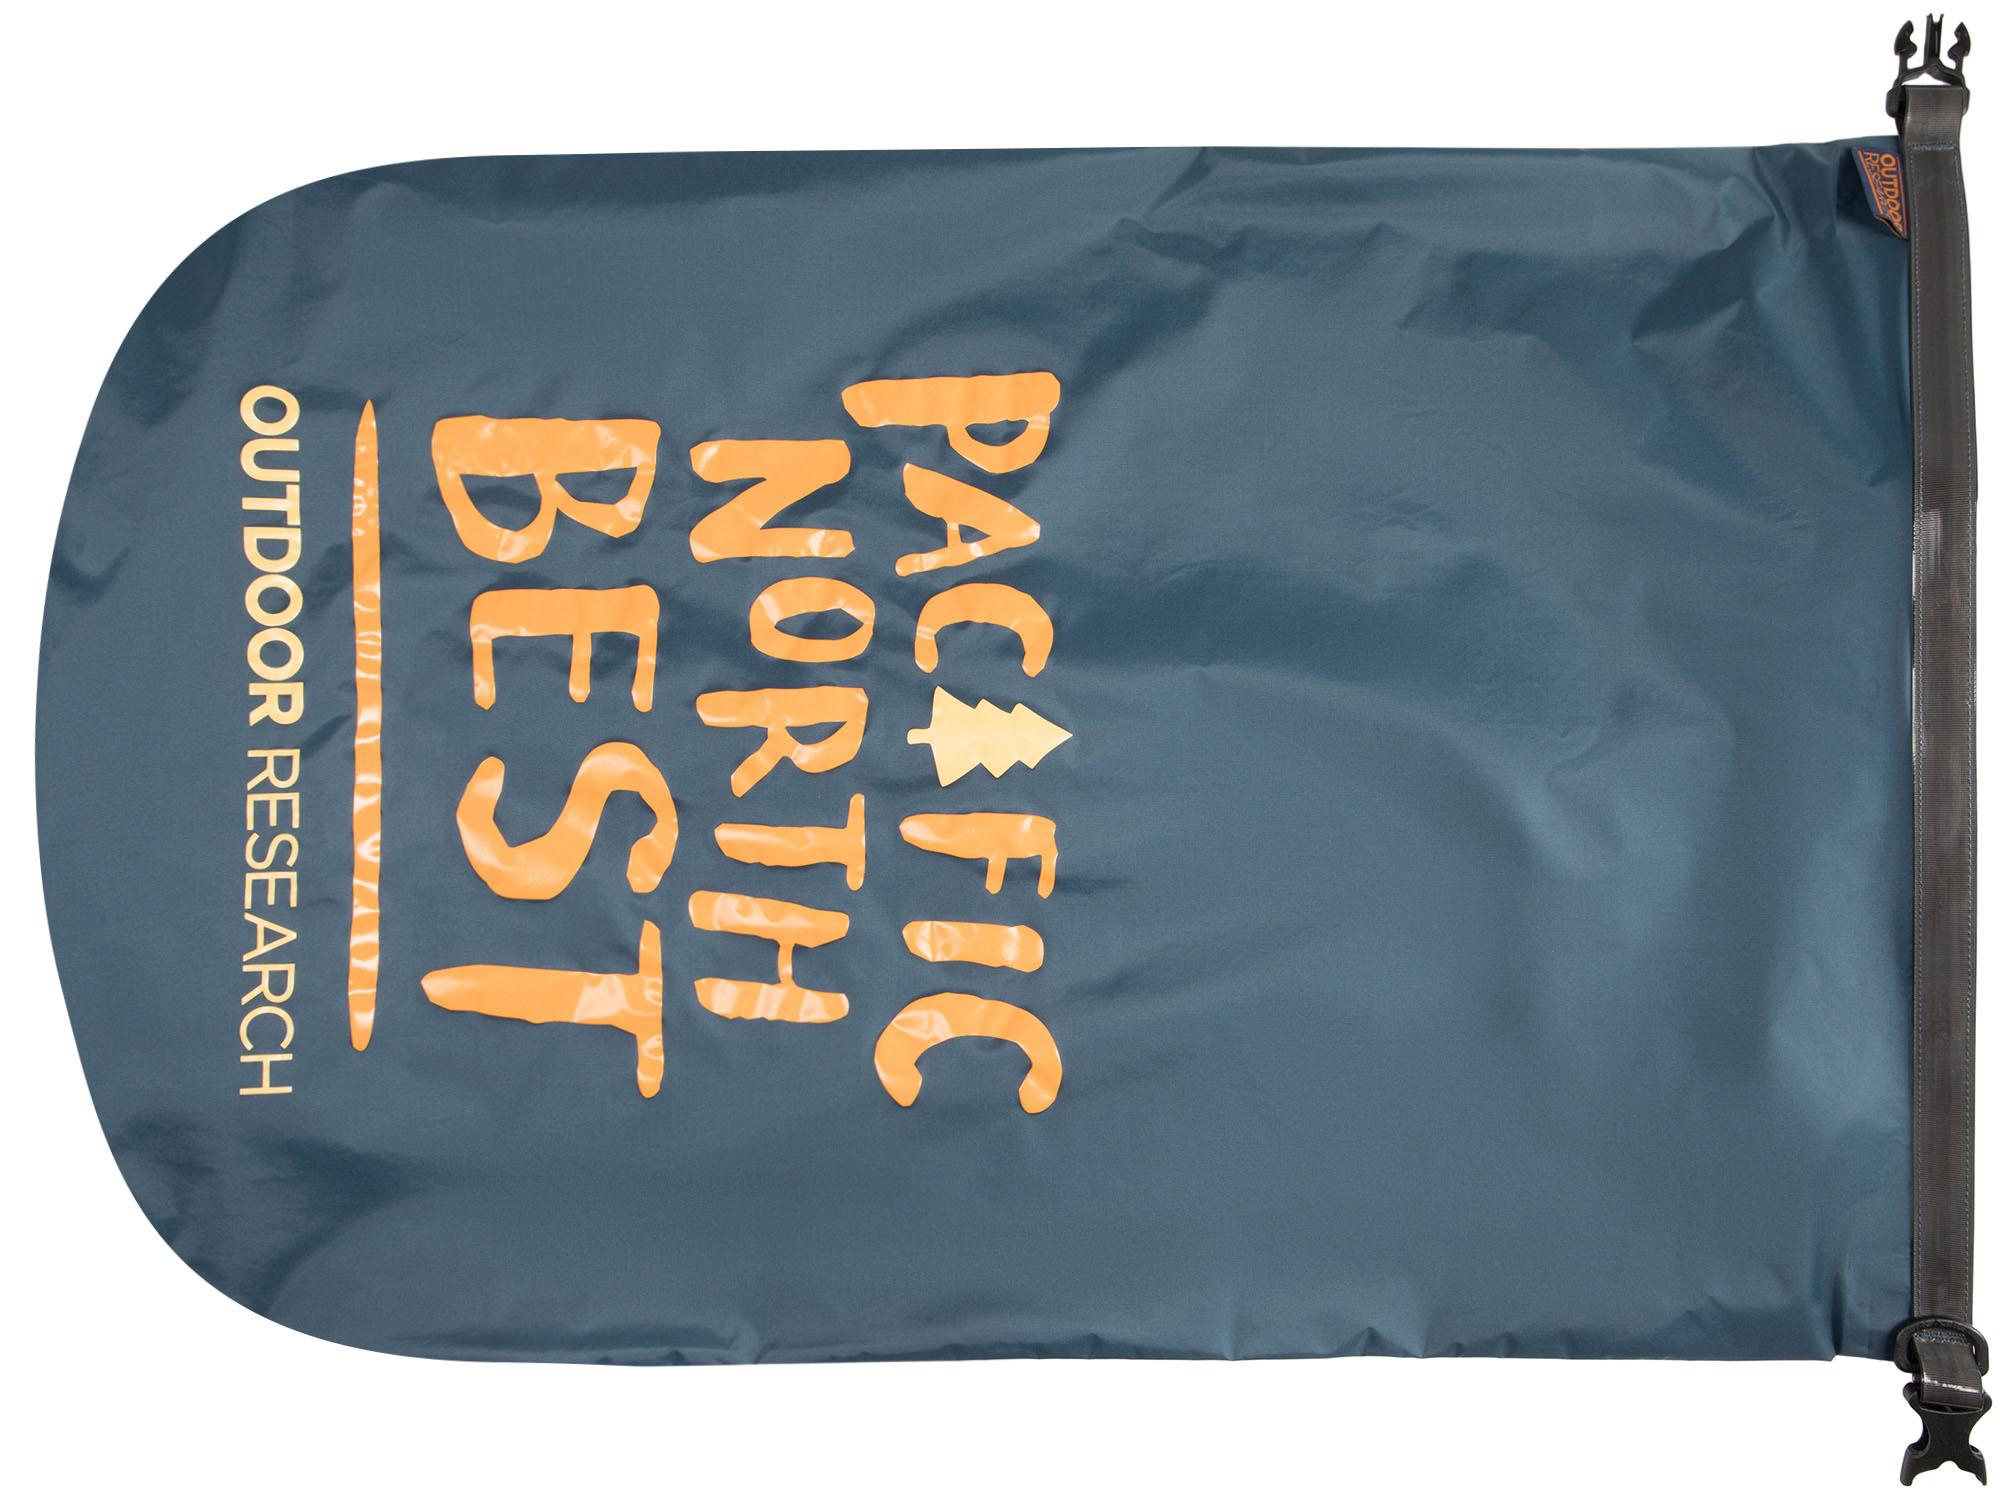 OUTDOOR RESEARCH Гермомешок OUTDOOR RESEARCH Pnw Best, 35 л outdoor research гермомешок outdoor script dry sack 10 л